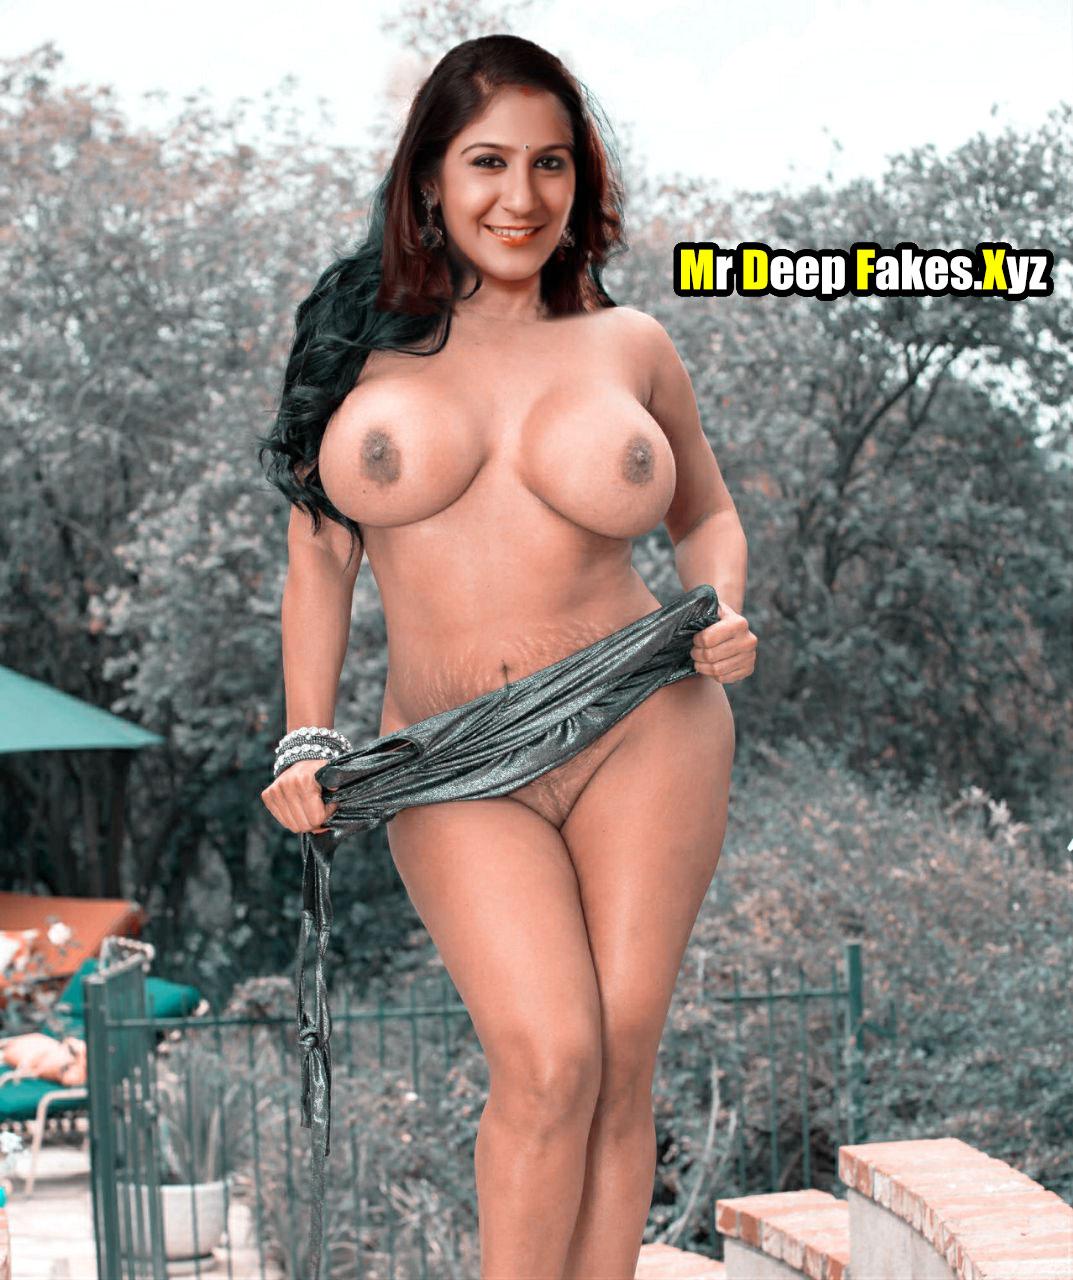 Shweta Mohan big boobs singer topless outdoor photoshoot